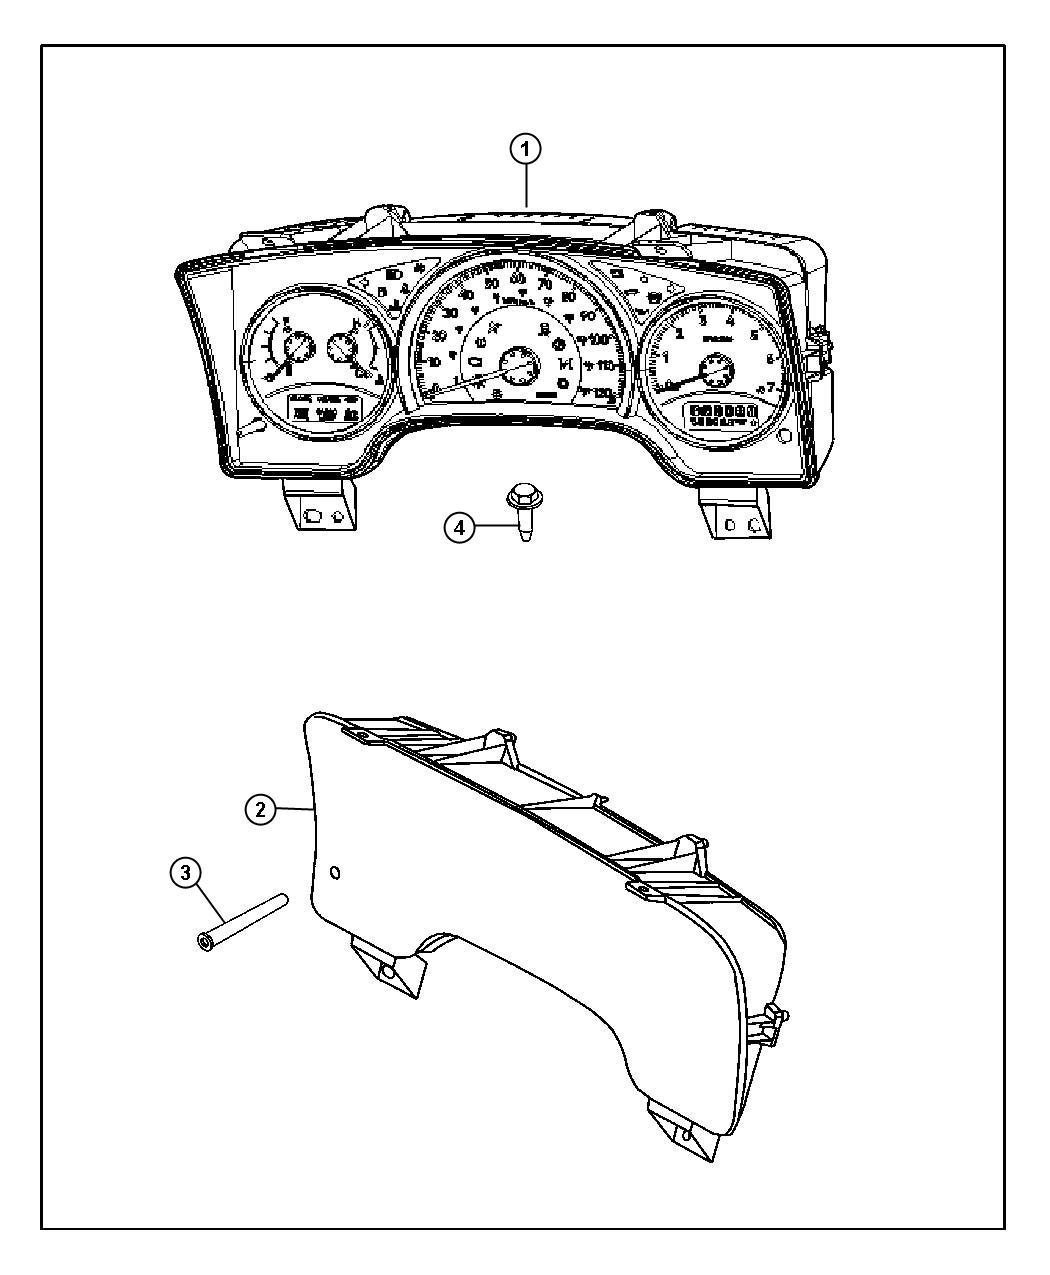 Dodge Dakota Cluster Instrument Panel 120 Mph Primary